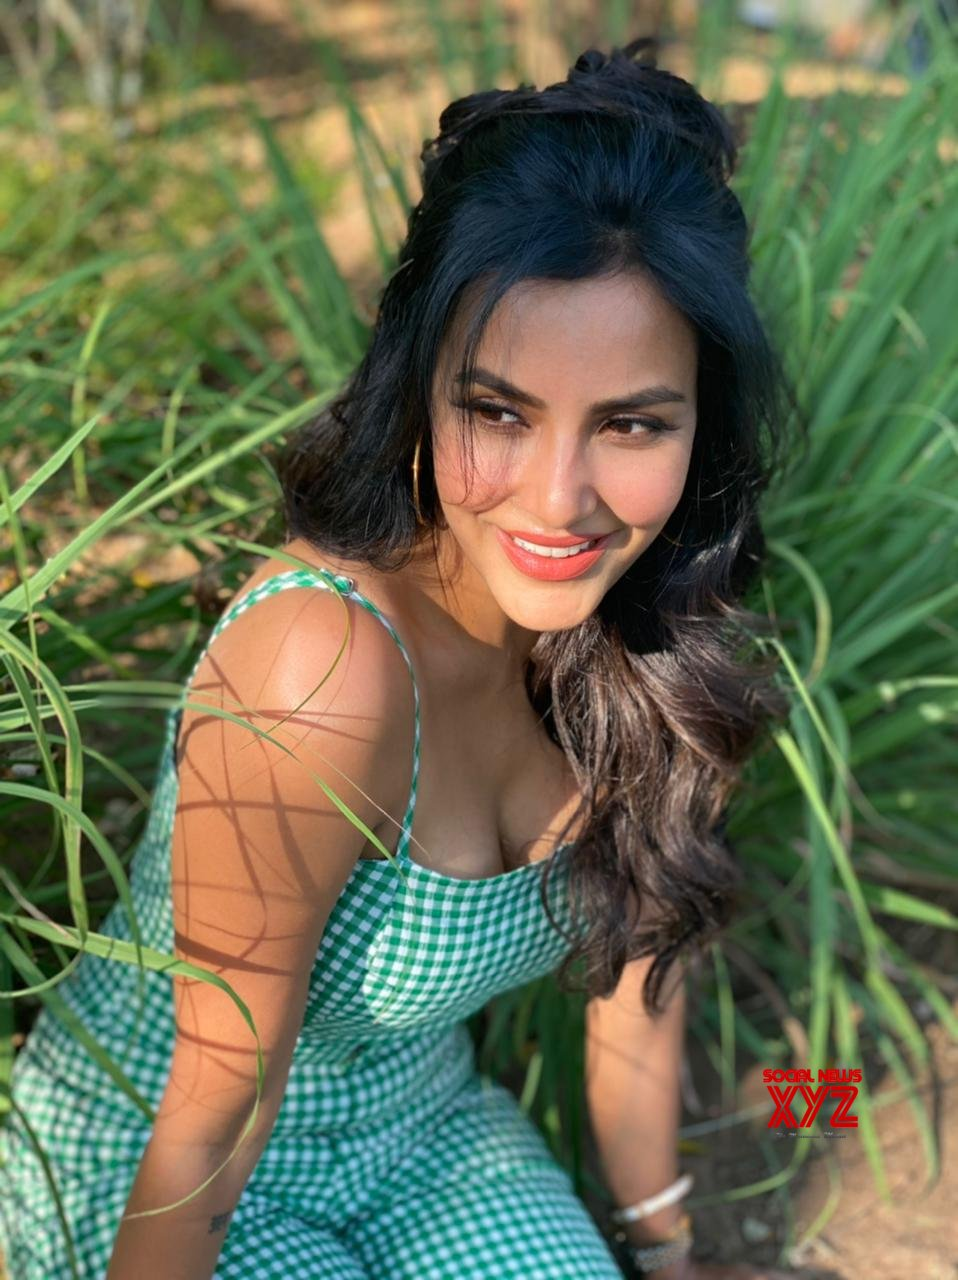 Actress Priya Anand Charming Stills From Shooting Spot